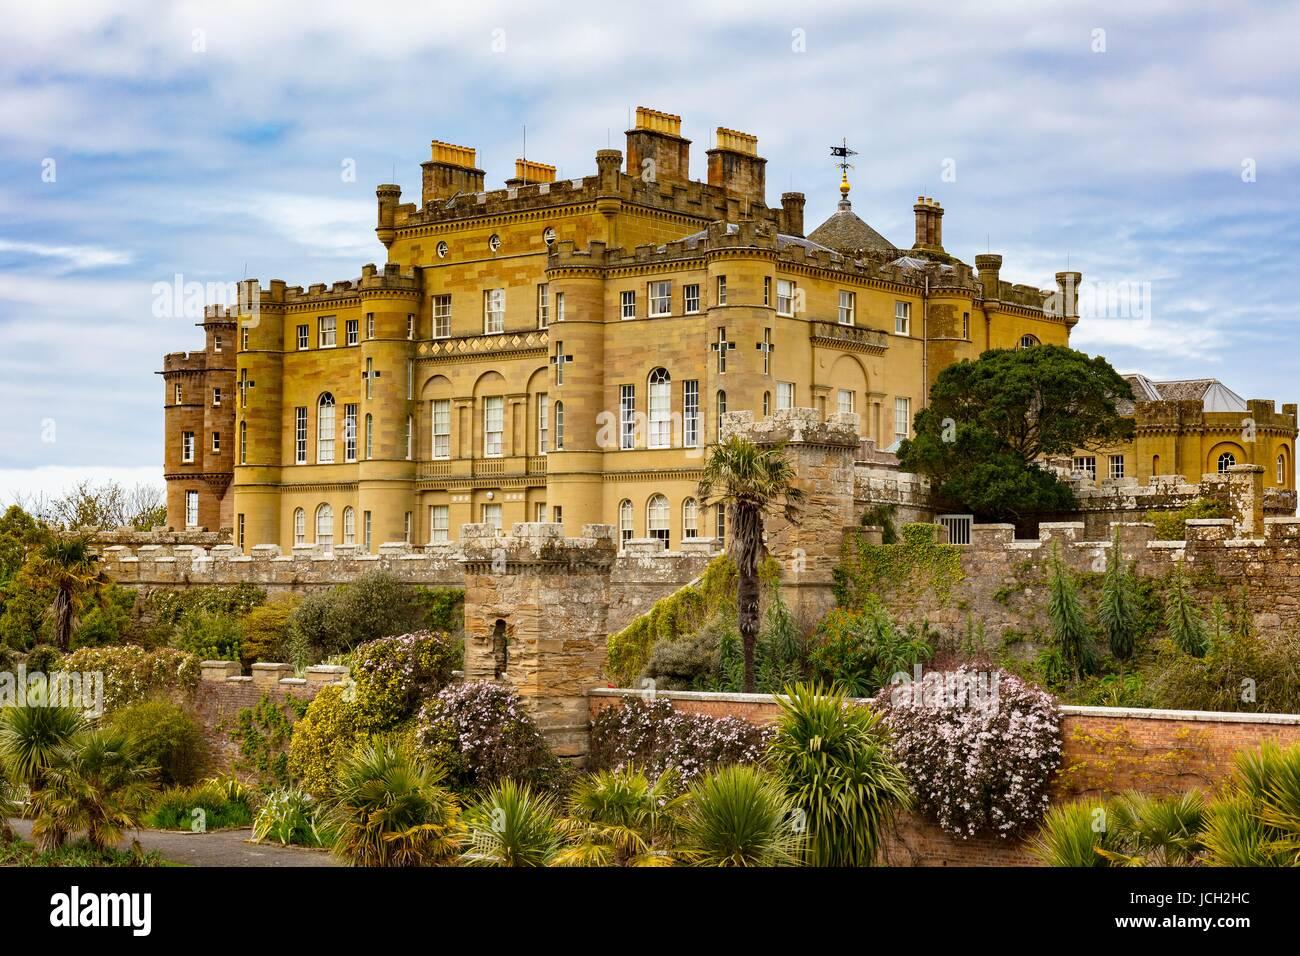 Colour photograph of Culzean Castle Scotland - Stock Image